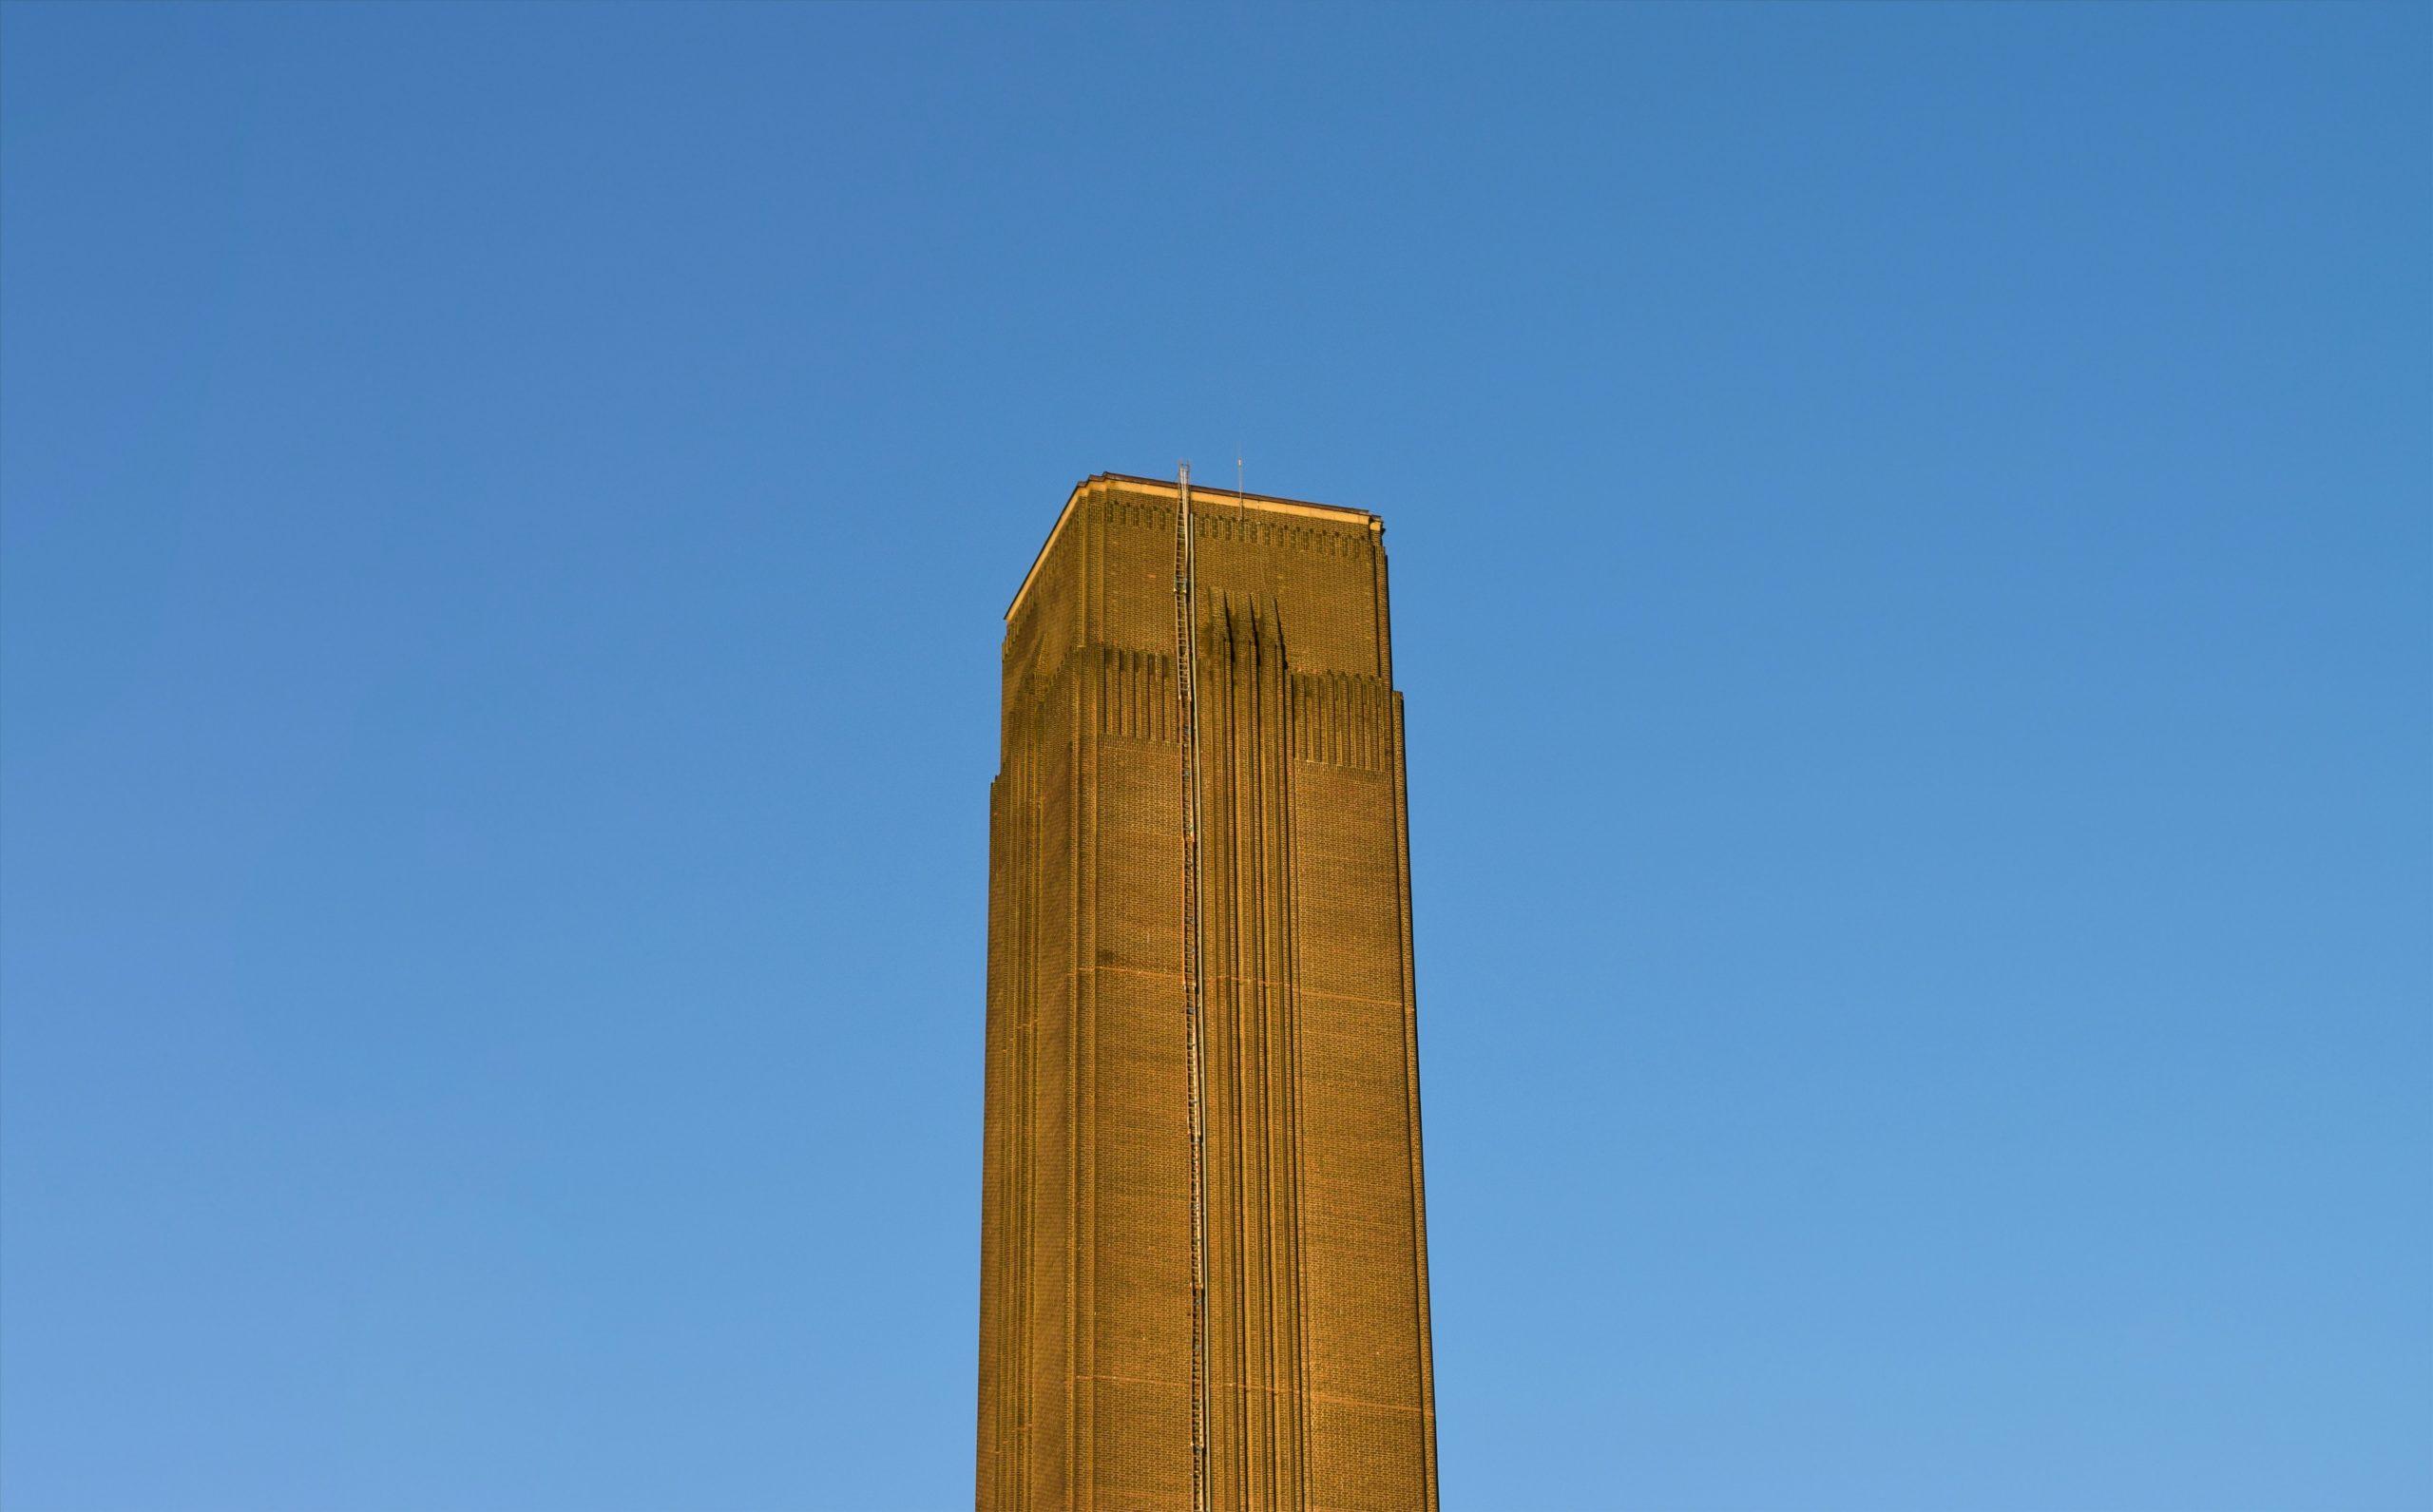 Tate Modern chimney. Photo by George Prentzas on Unsplash